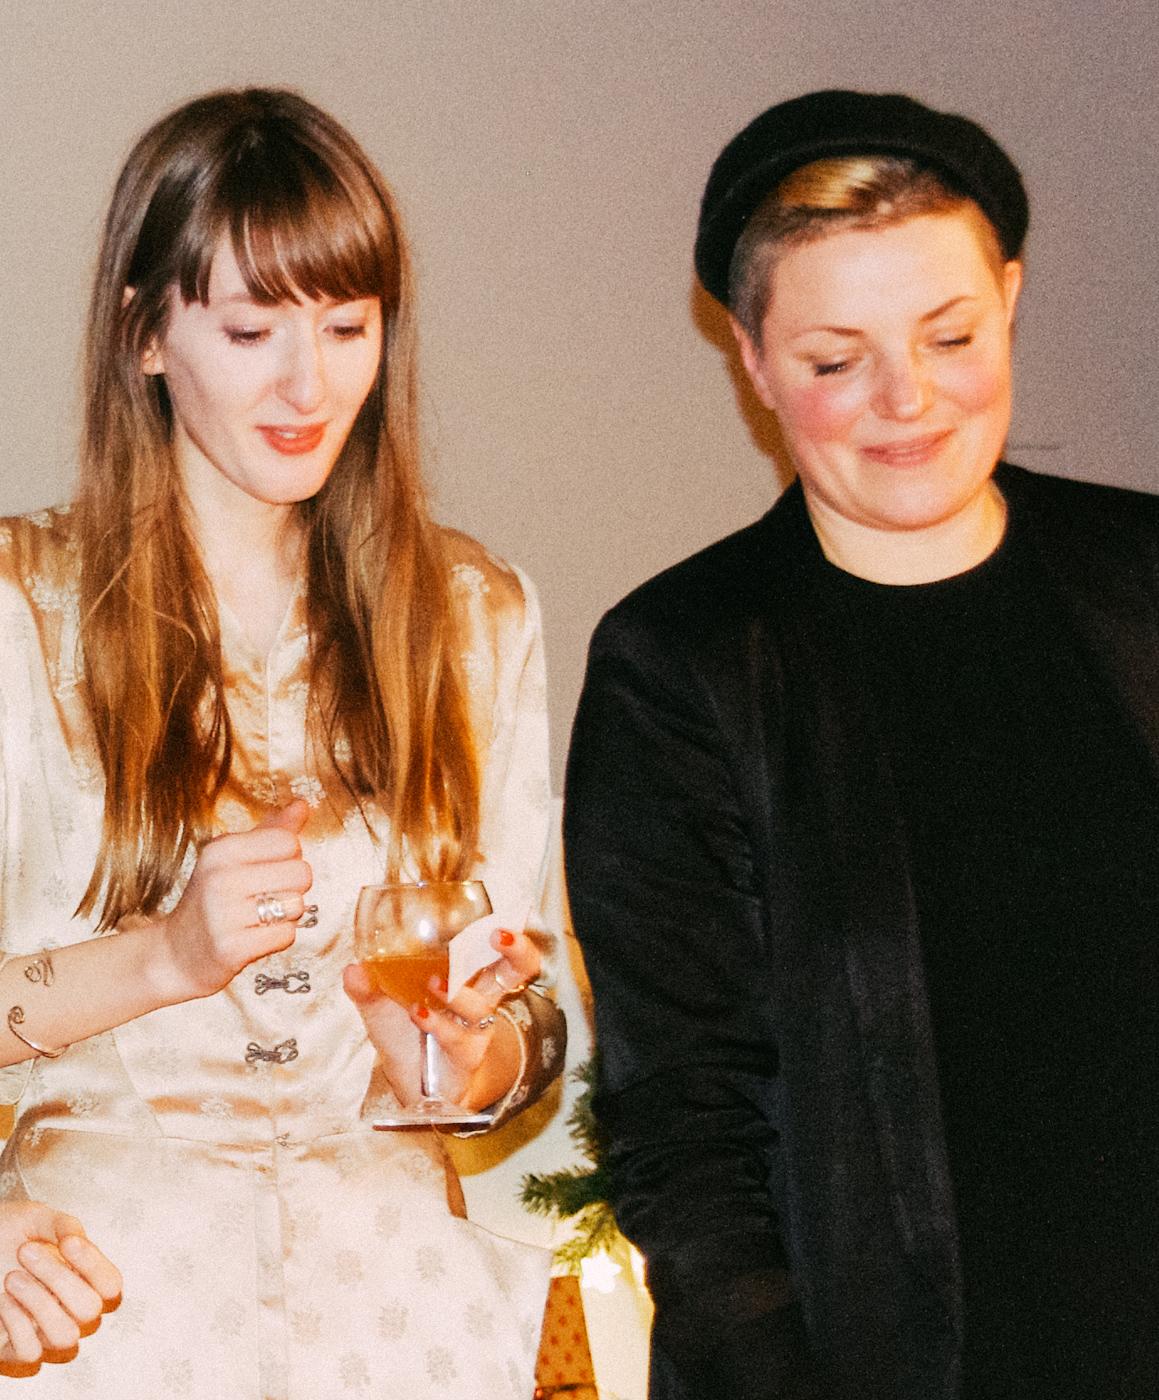 sustainable-fashion-network-berlin-12.jpg